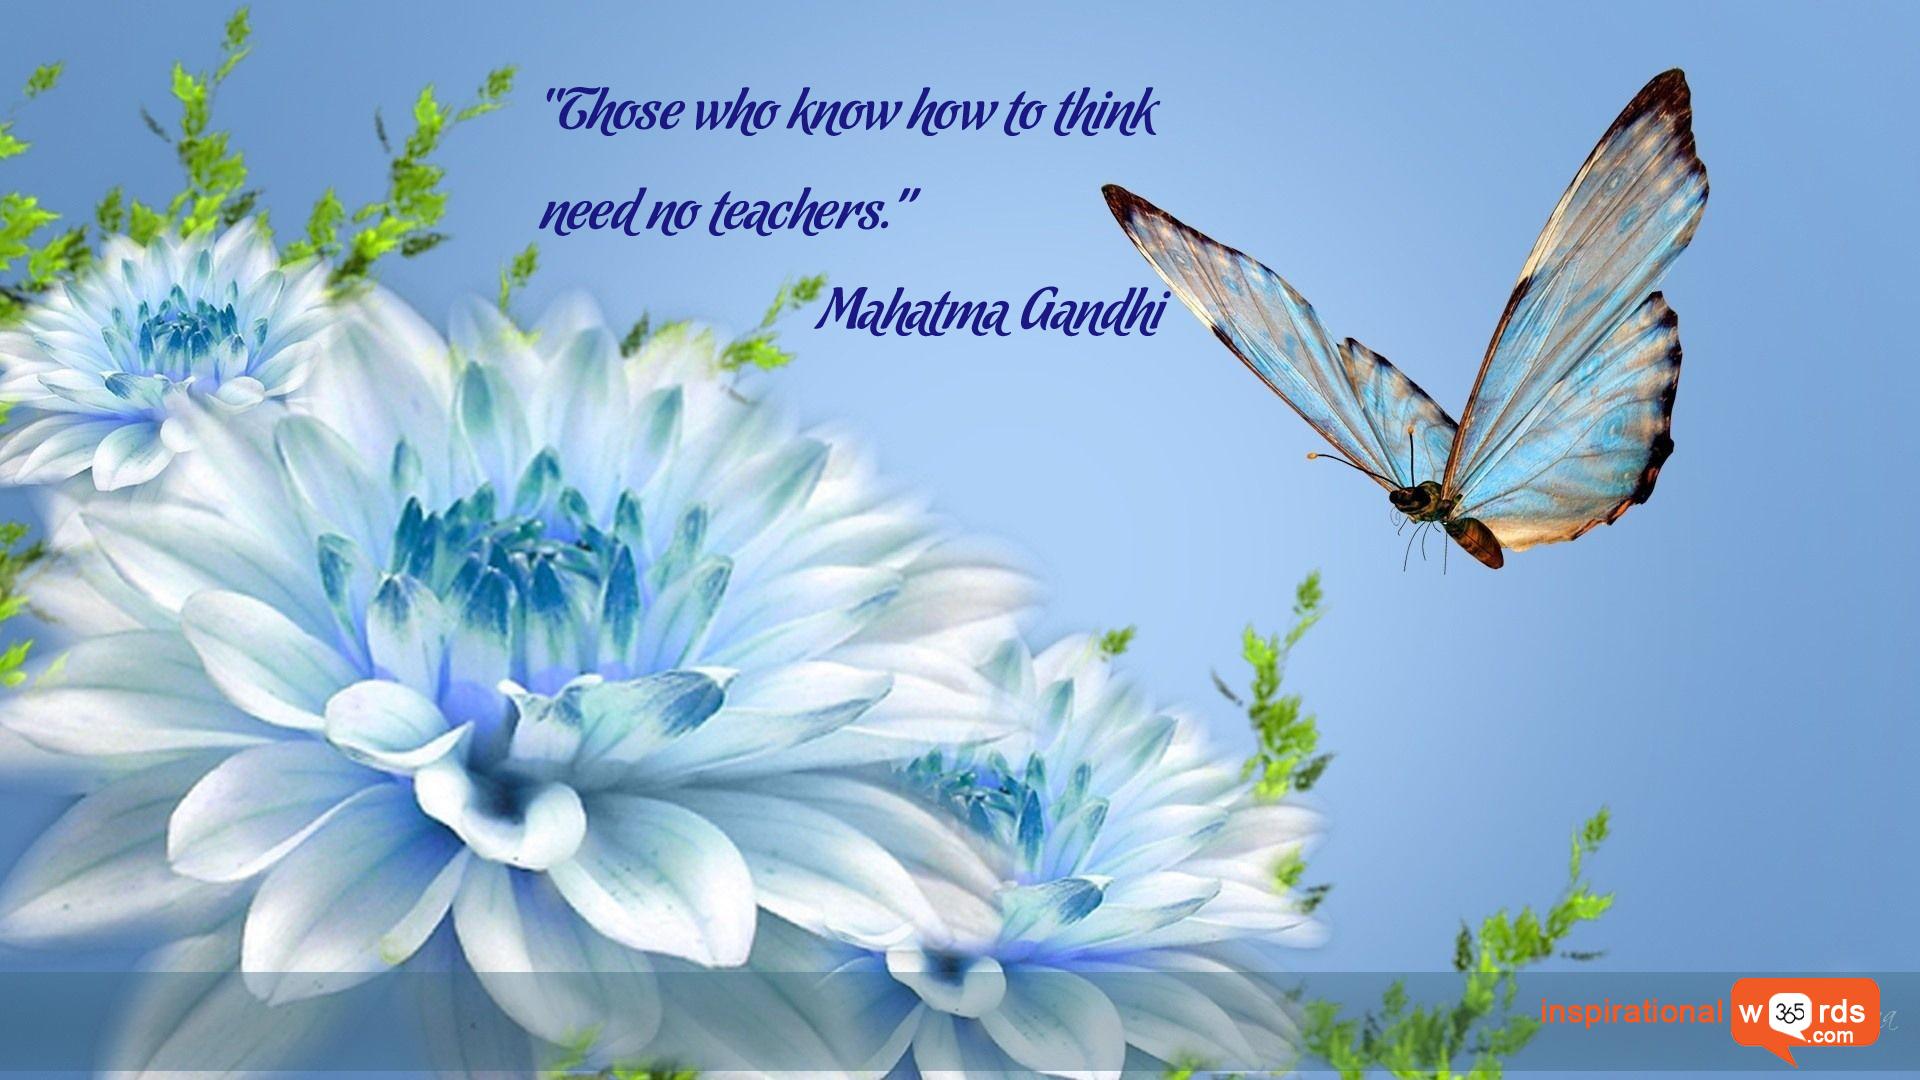 Inspirational Wallpaper Quote by Mahatma Gandhi